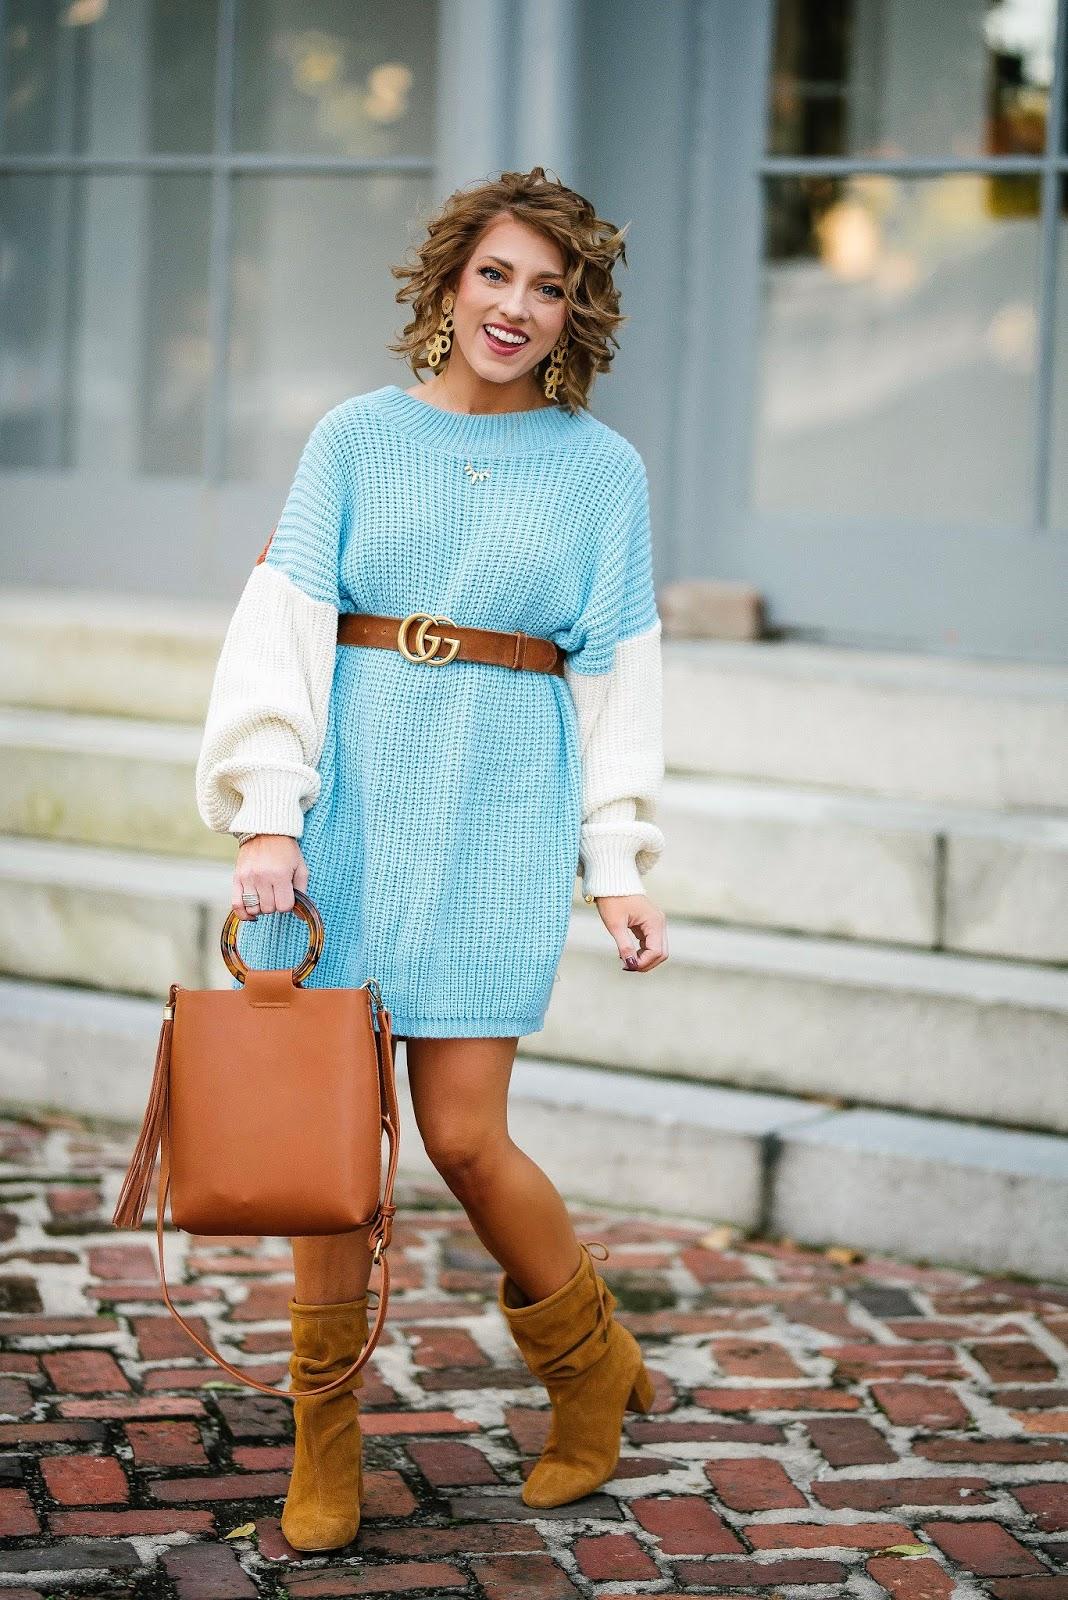 $40 Color Block Sweater Dress + Gucci Belt - Something Delightful Blog #fallfashion #fallstyle #sweaterdress